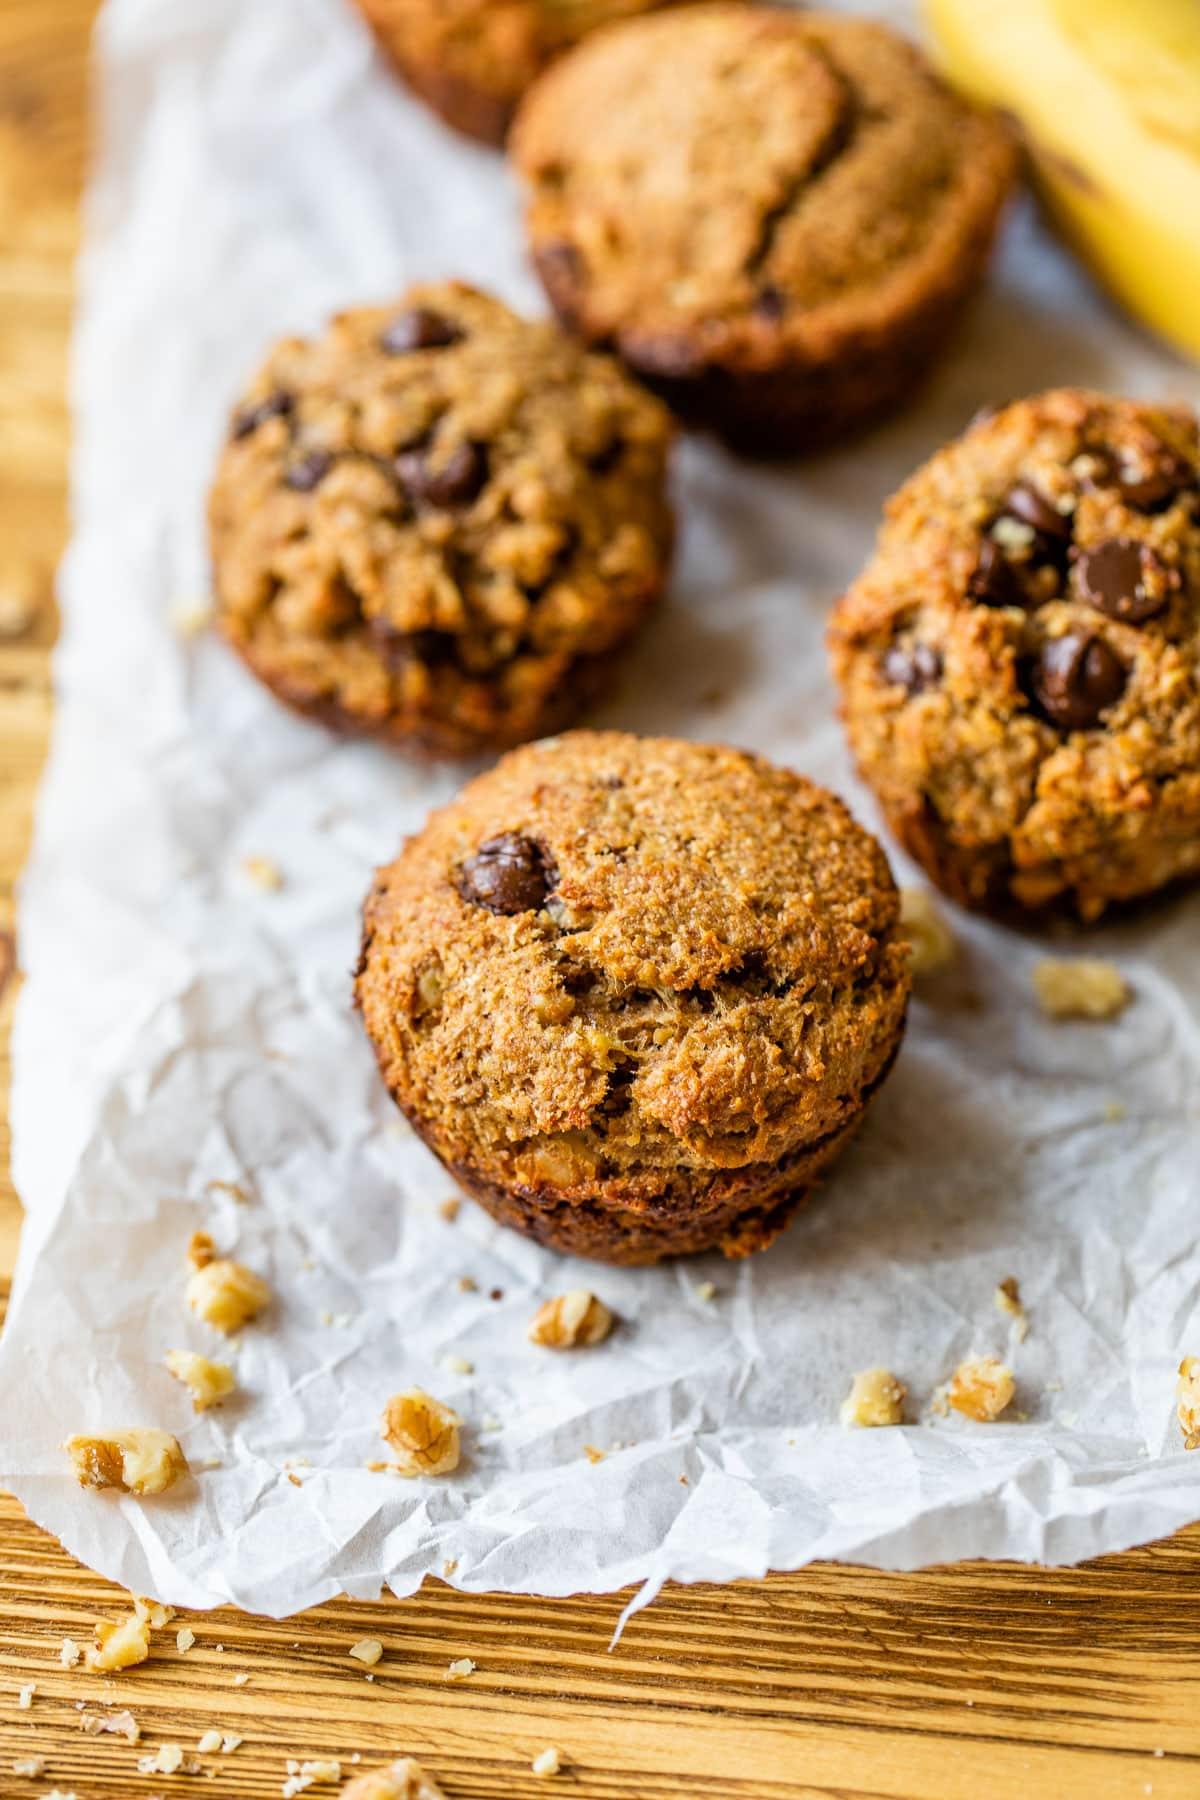 Banana bran muffins with chocolate chips